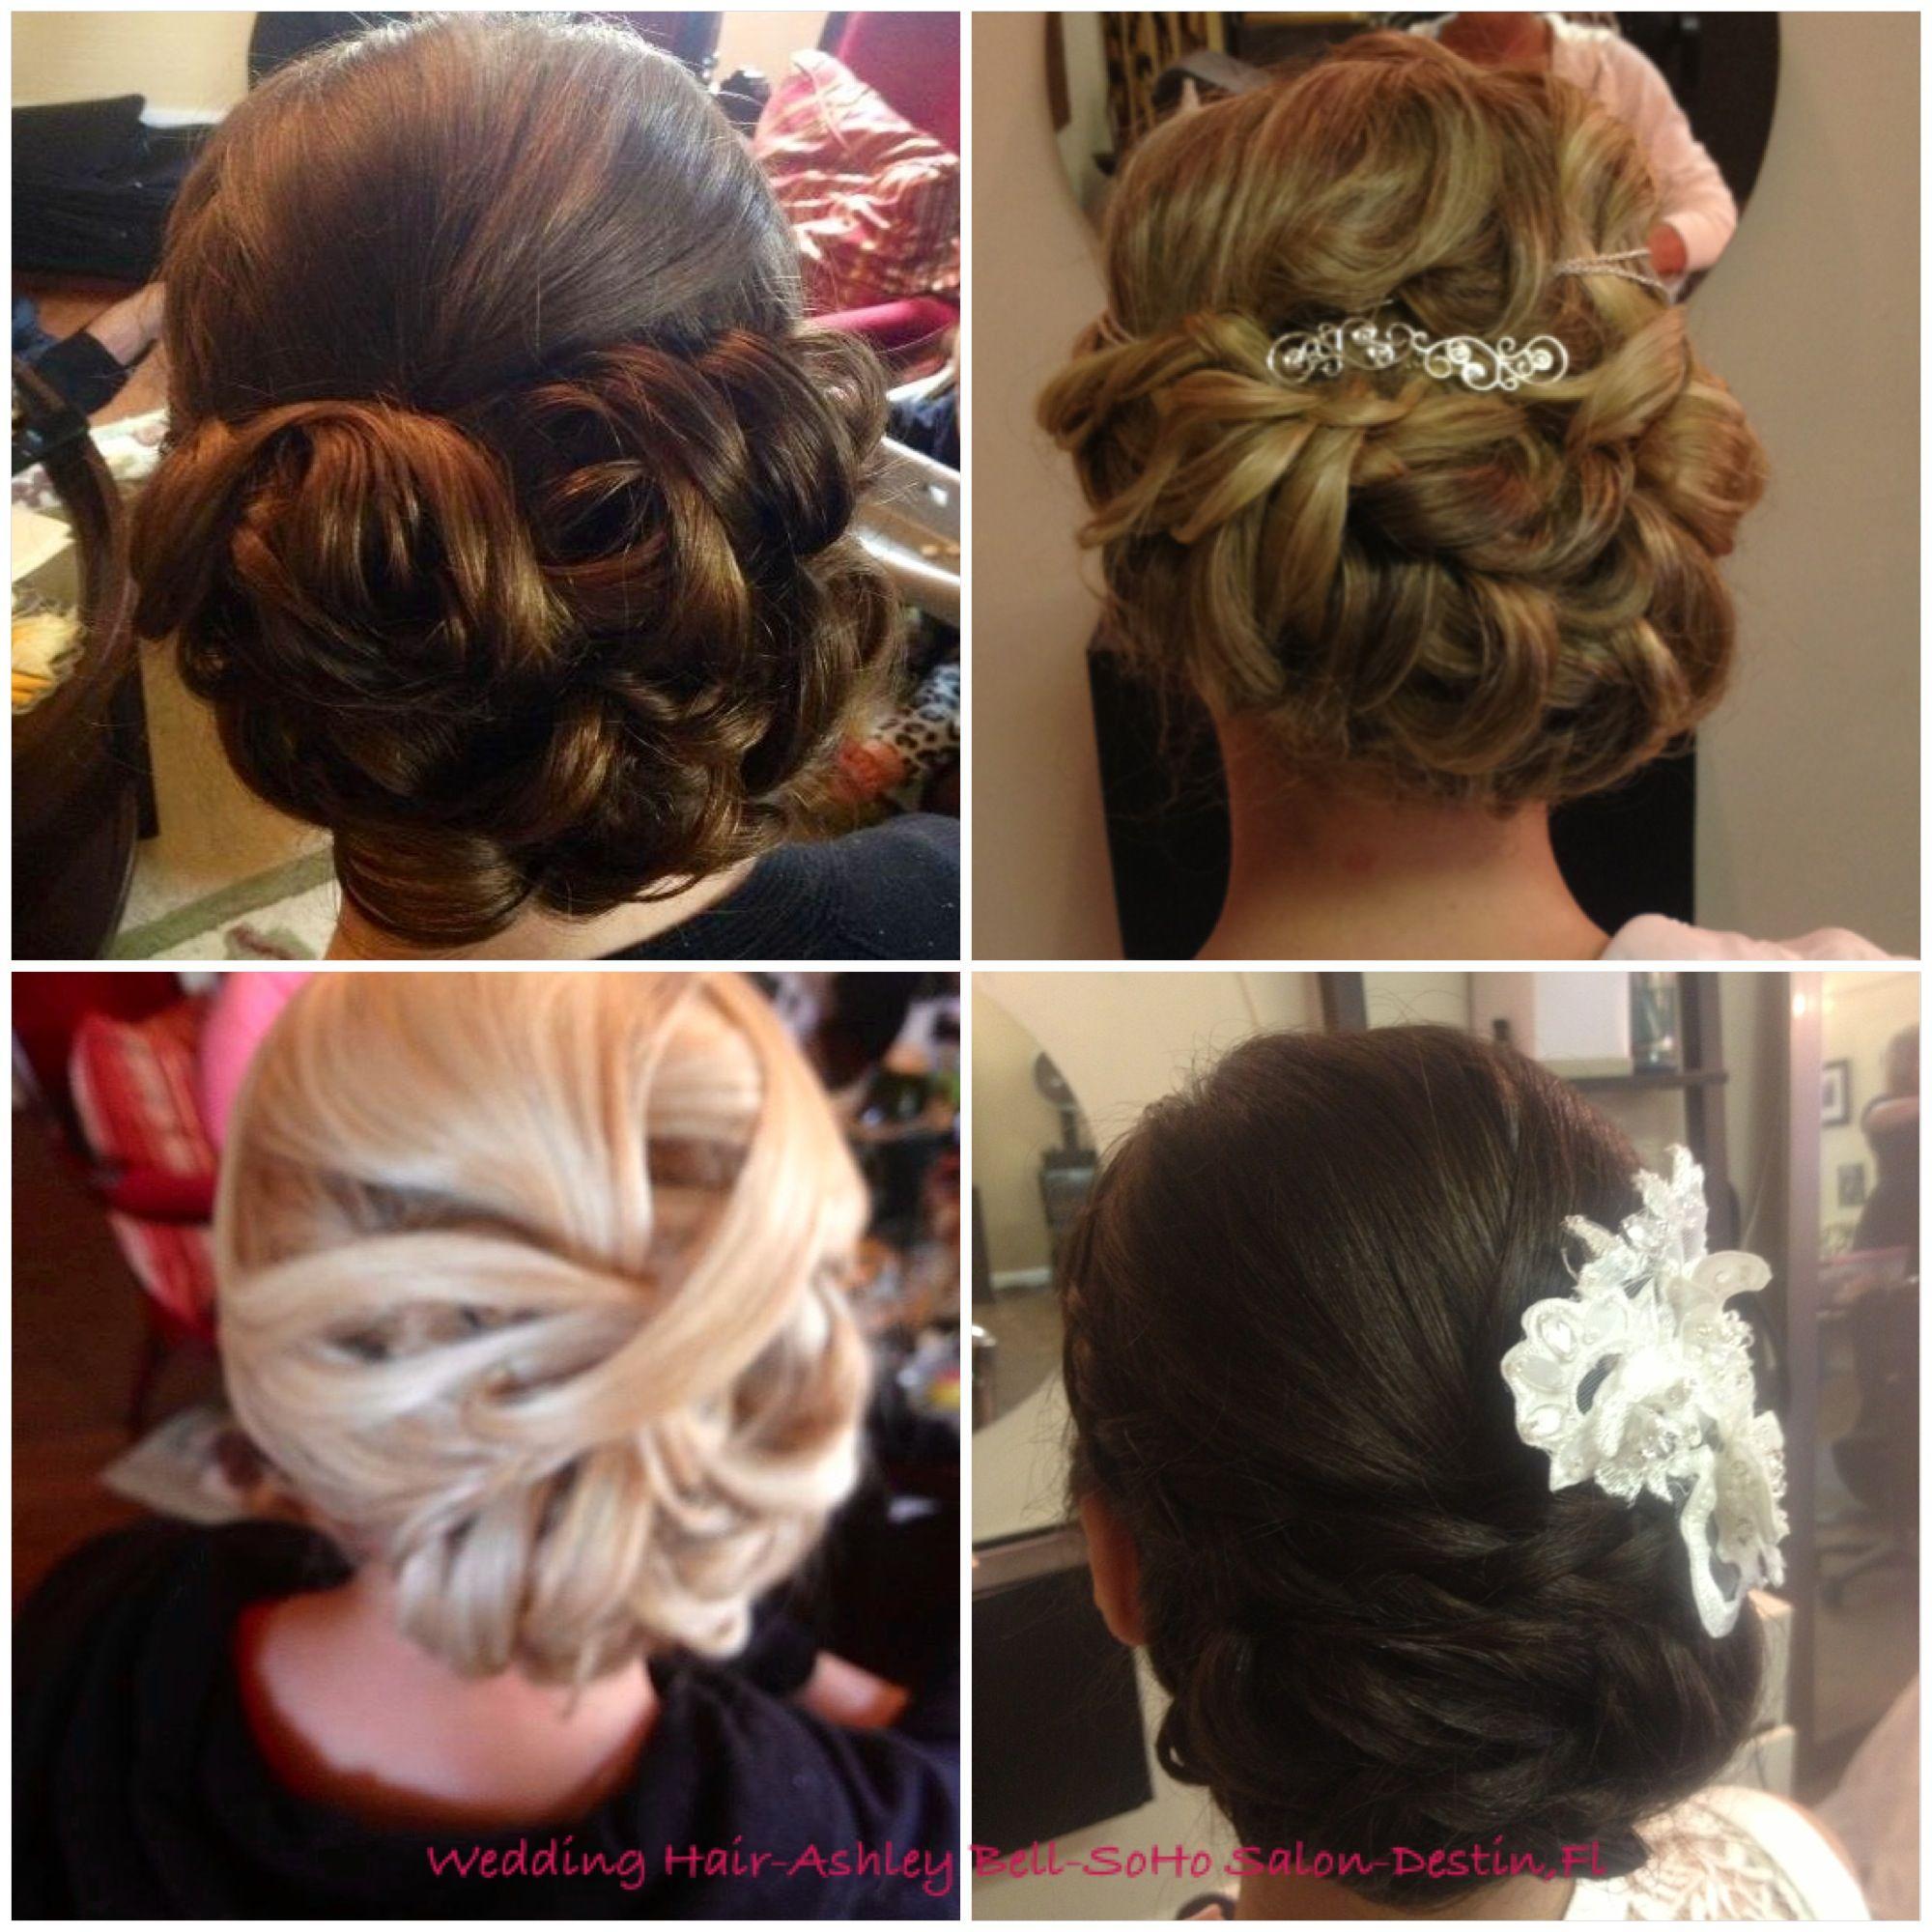 wedding hair by ashley bell, soho salon, destin, fl   hair and make